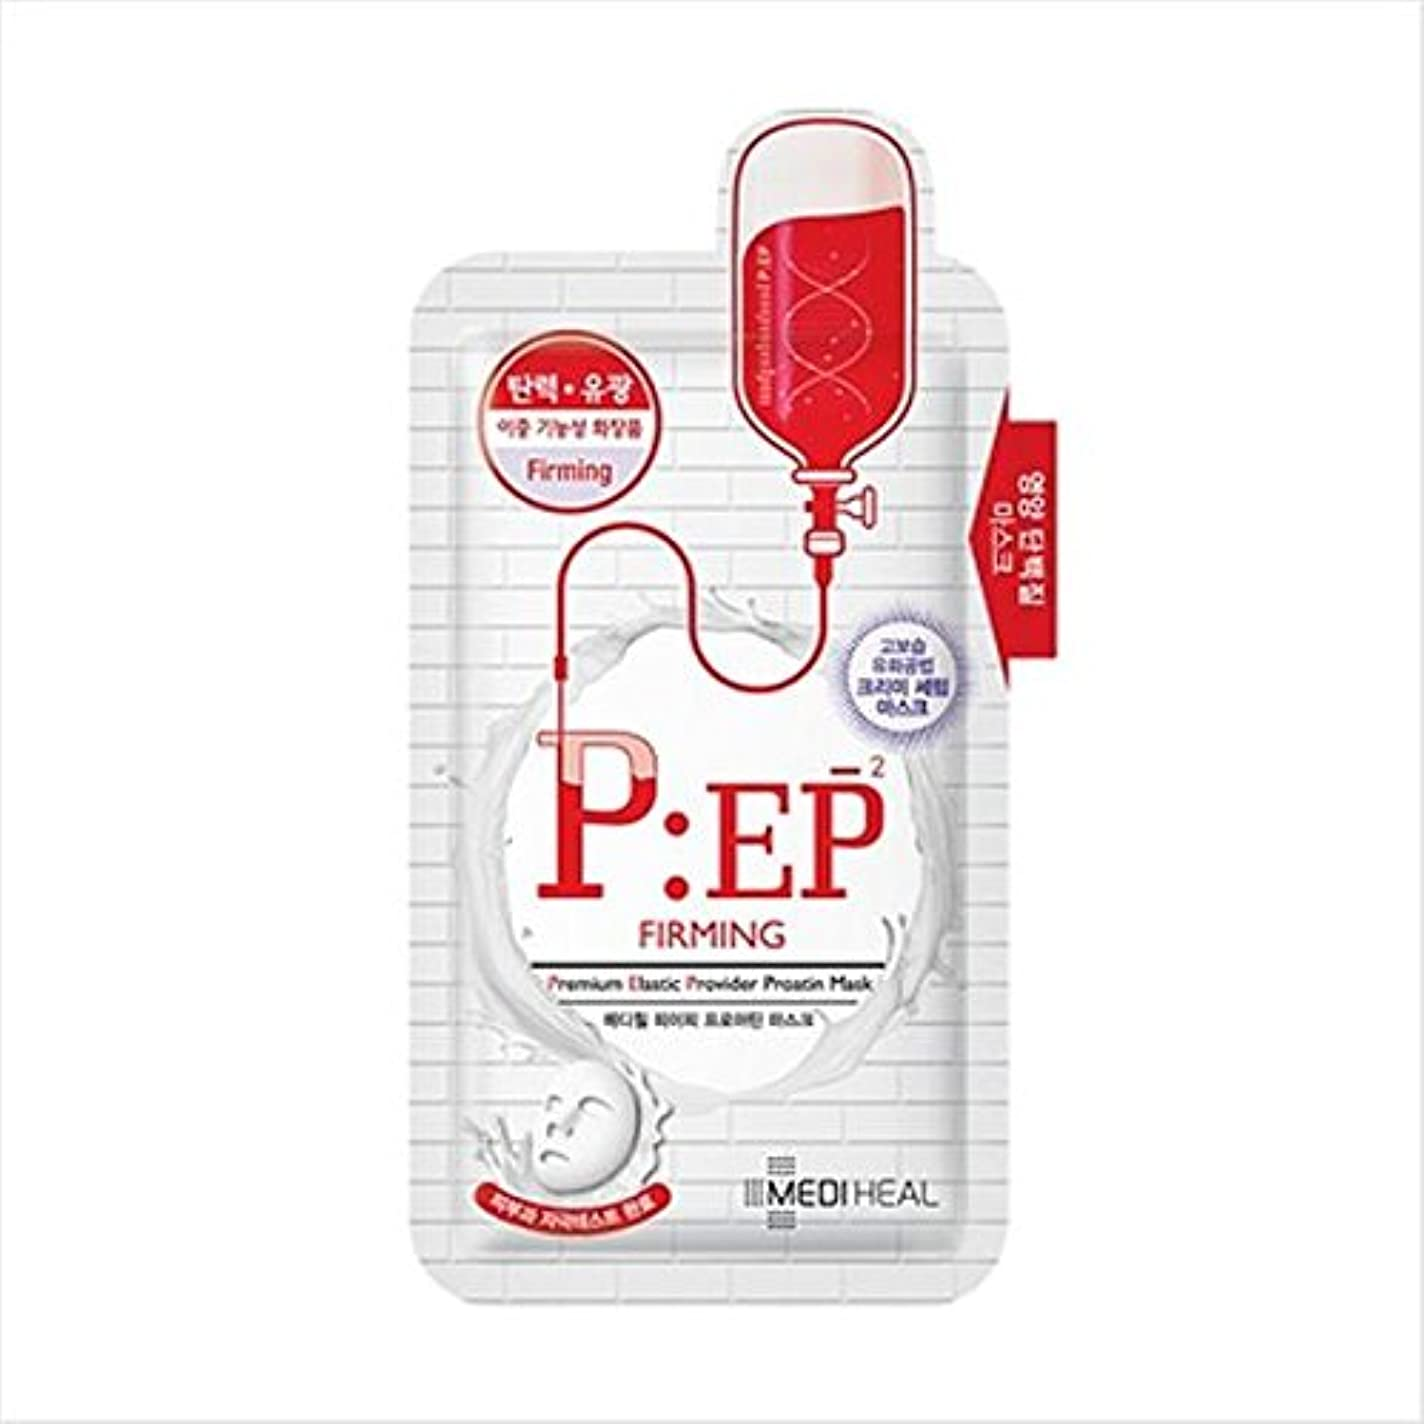 Mediheal P.E.P メディエアファーミングプロテインマスク(アクアリング)25 g x 10枚[並行輸入品]